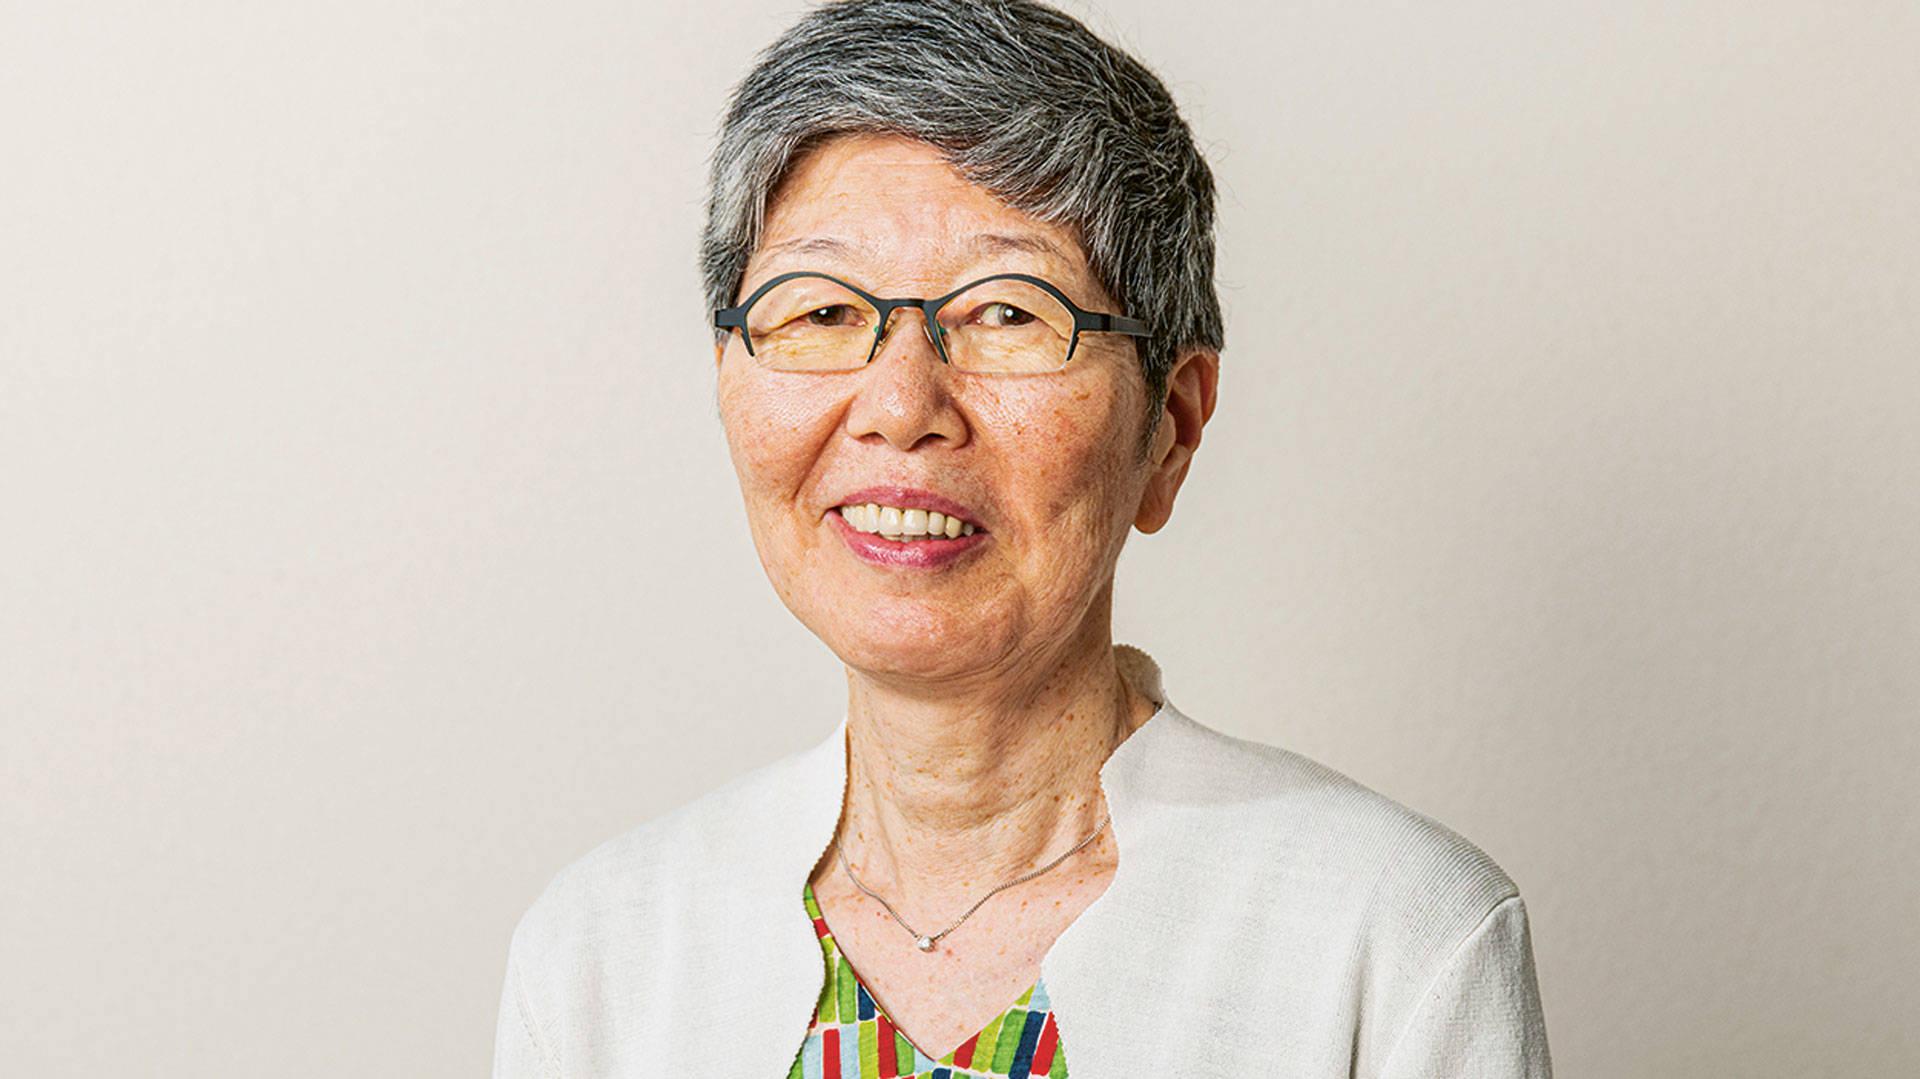 Professor Yuko Harayama, Executive Director of International  Affairs at RIKEN, Japan's largest non-university research institution